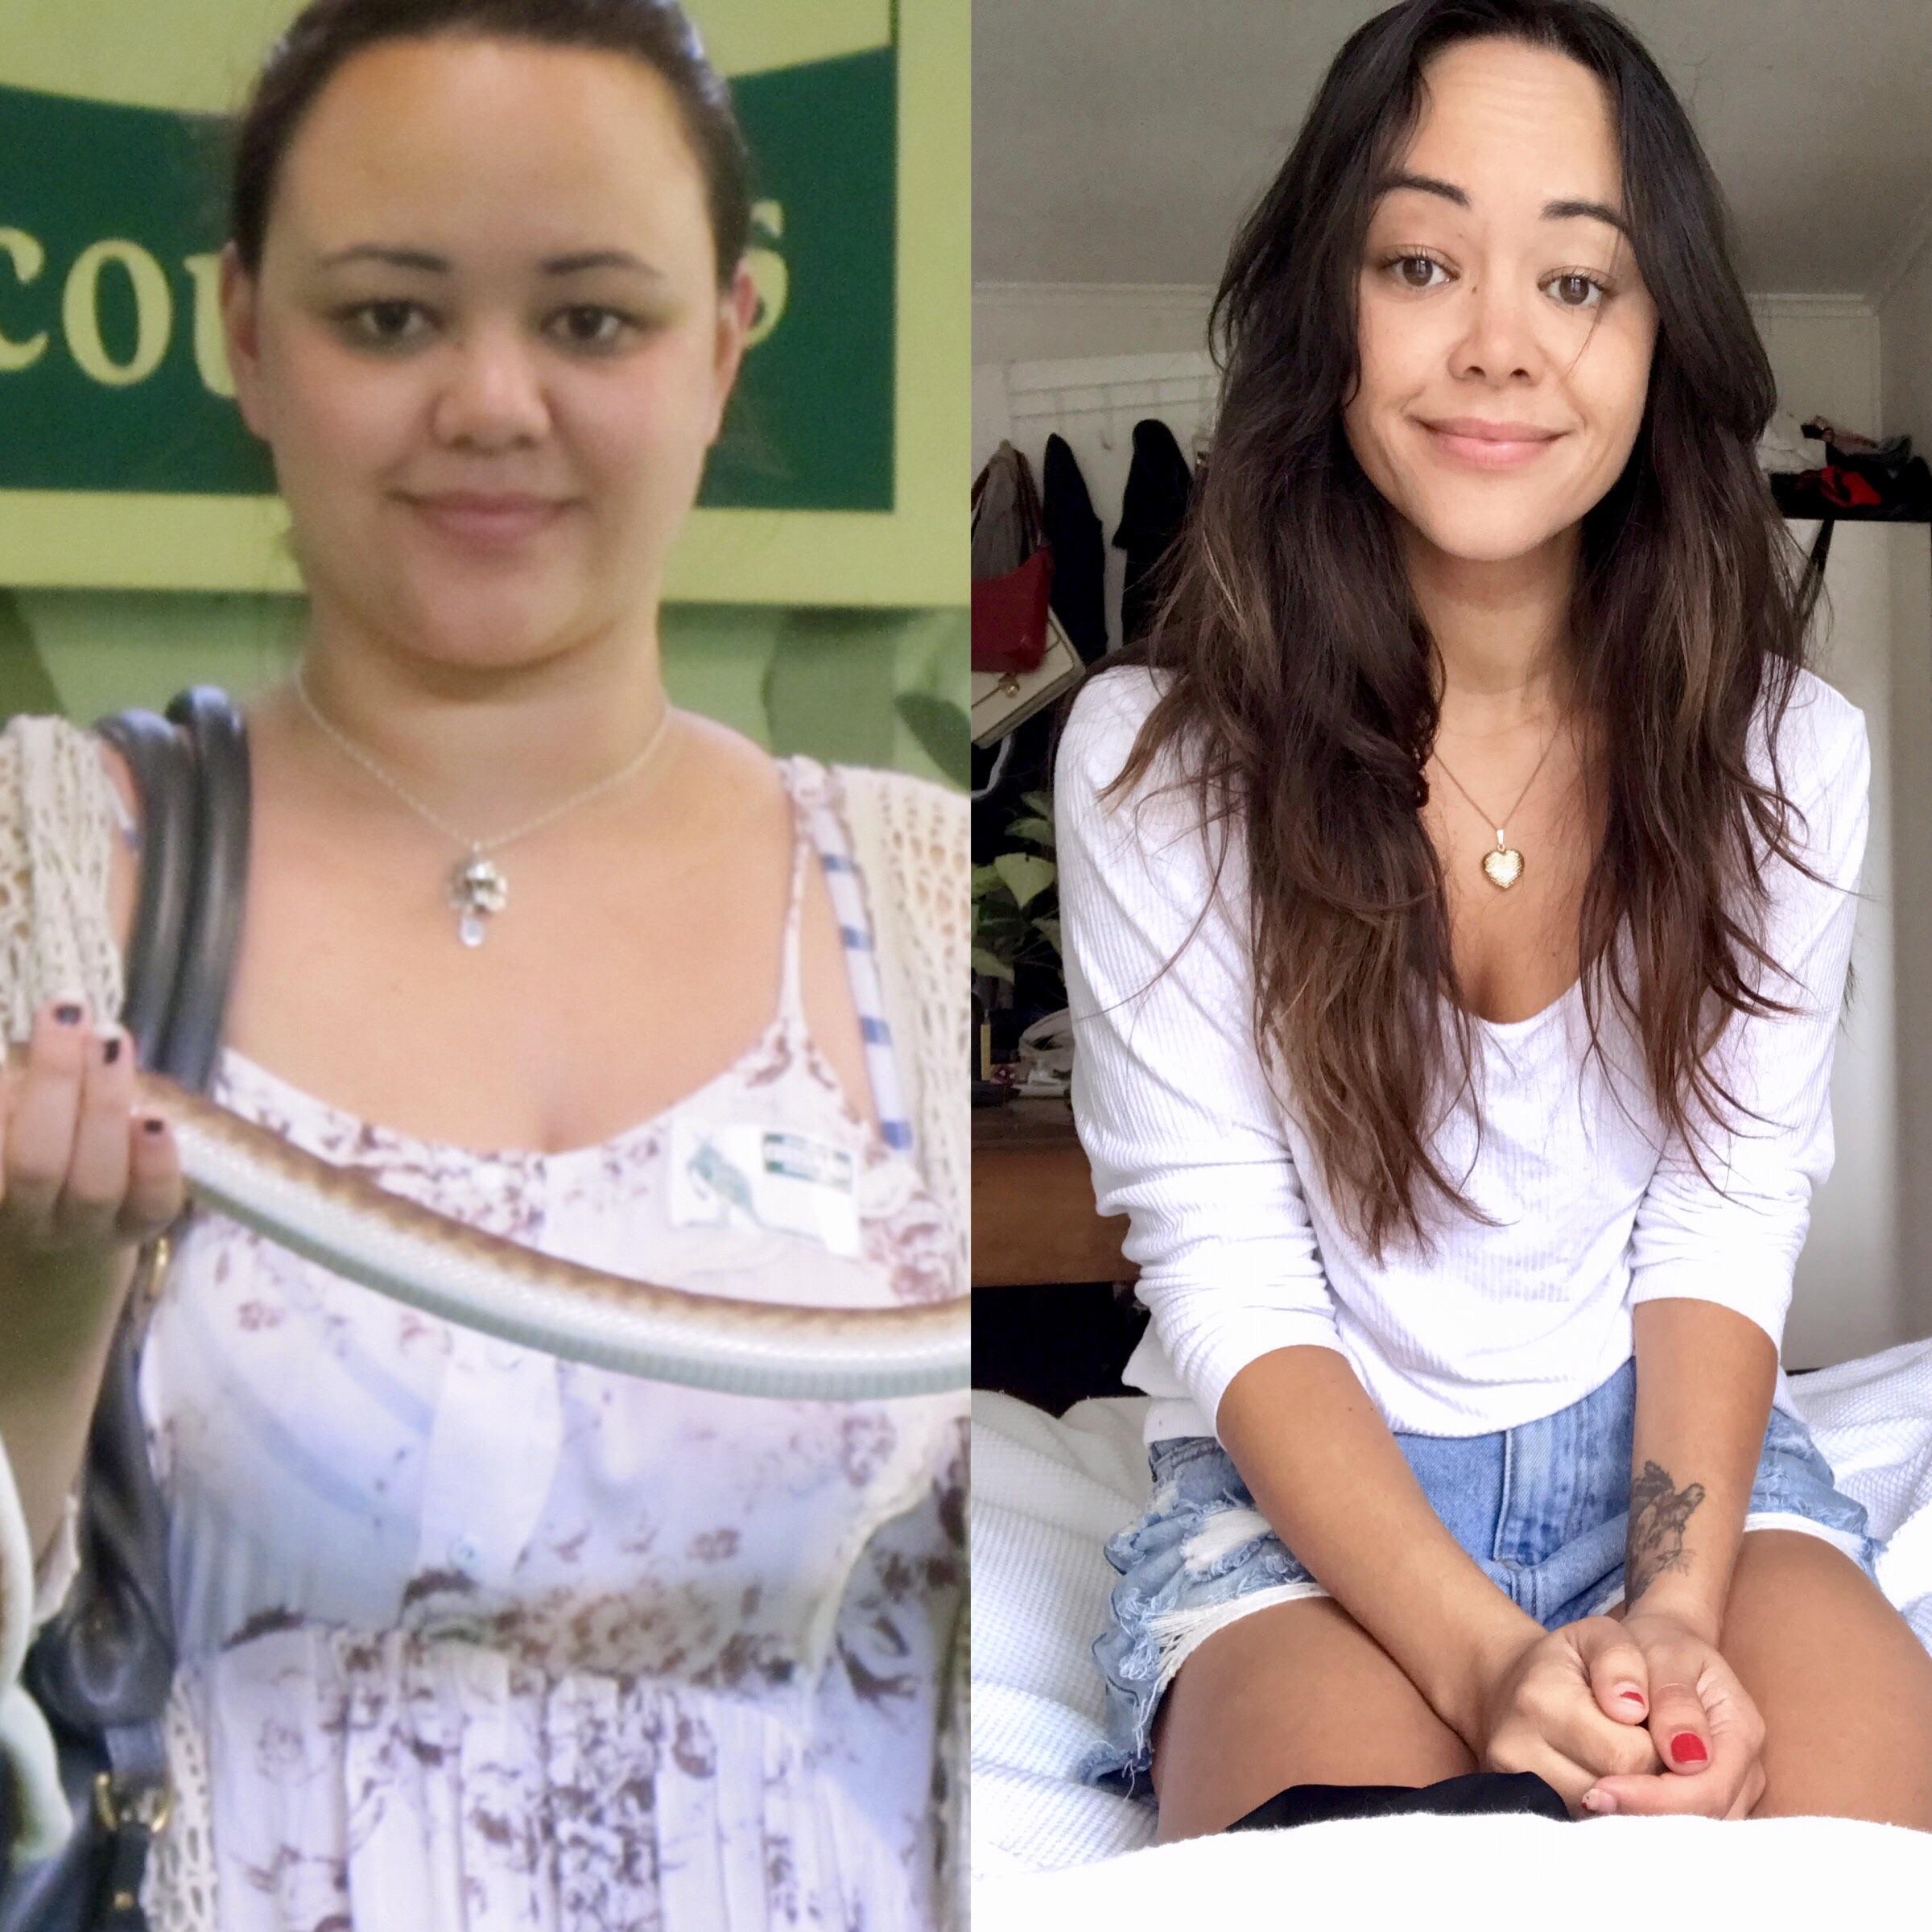 Progress Pics of 74 lbs Weight Loss 5 foot 6 Female 200 lbs to 126 lbs